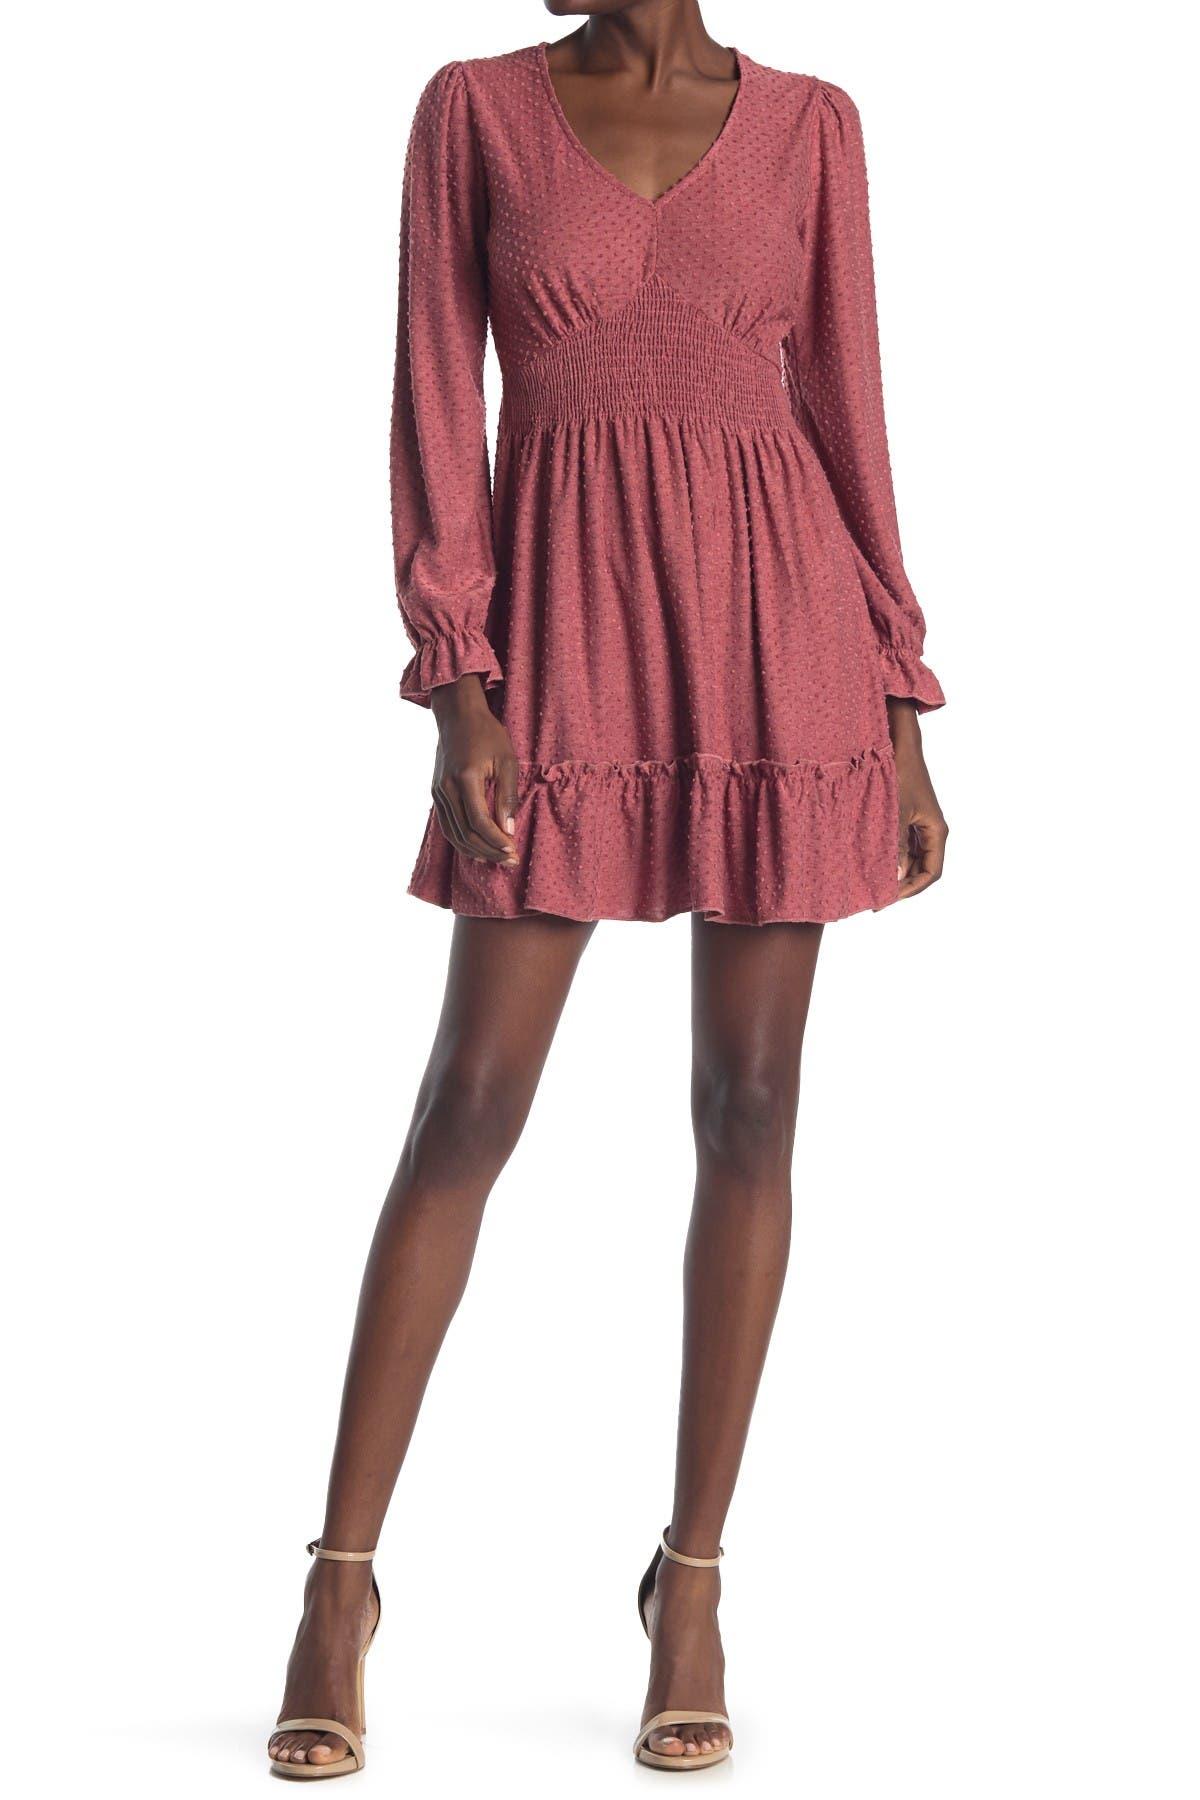 Image of KENEDIK Knit Clip Dot Smocked Waist Dress